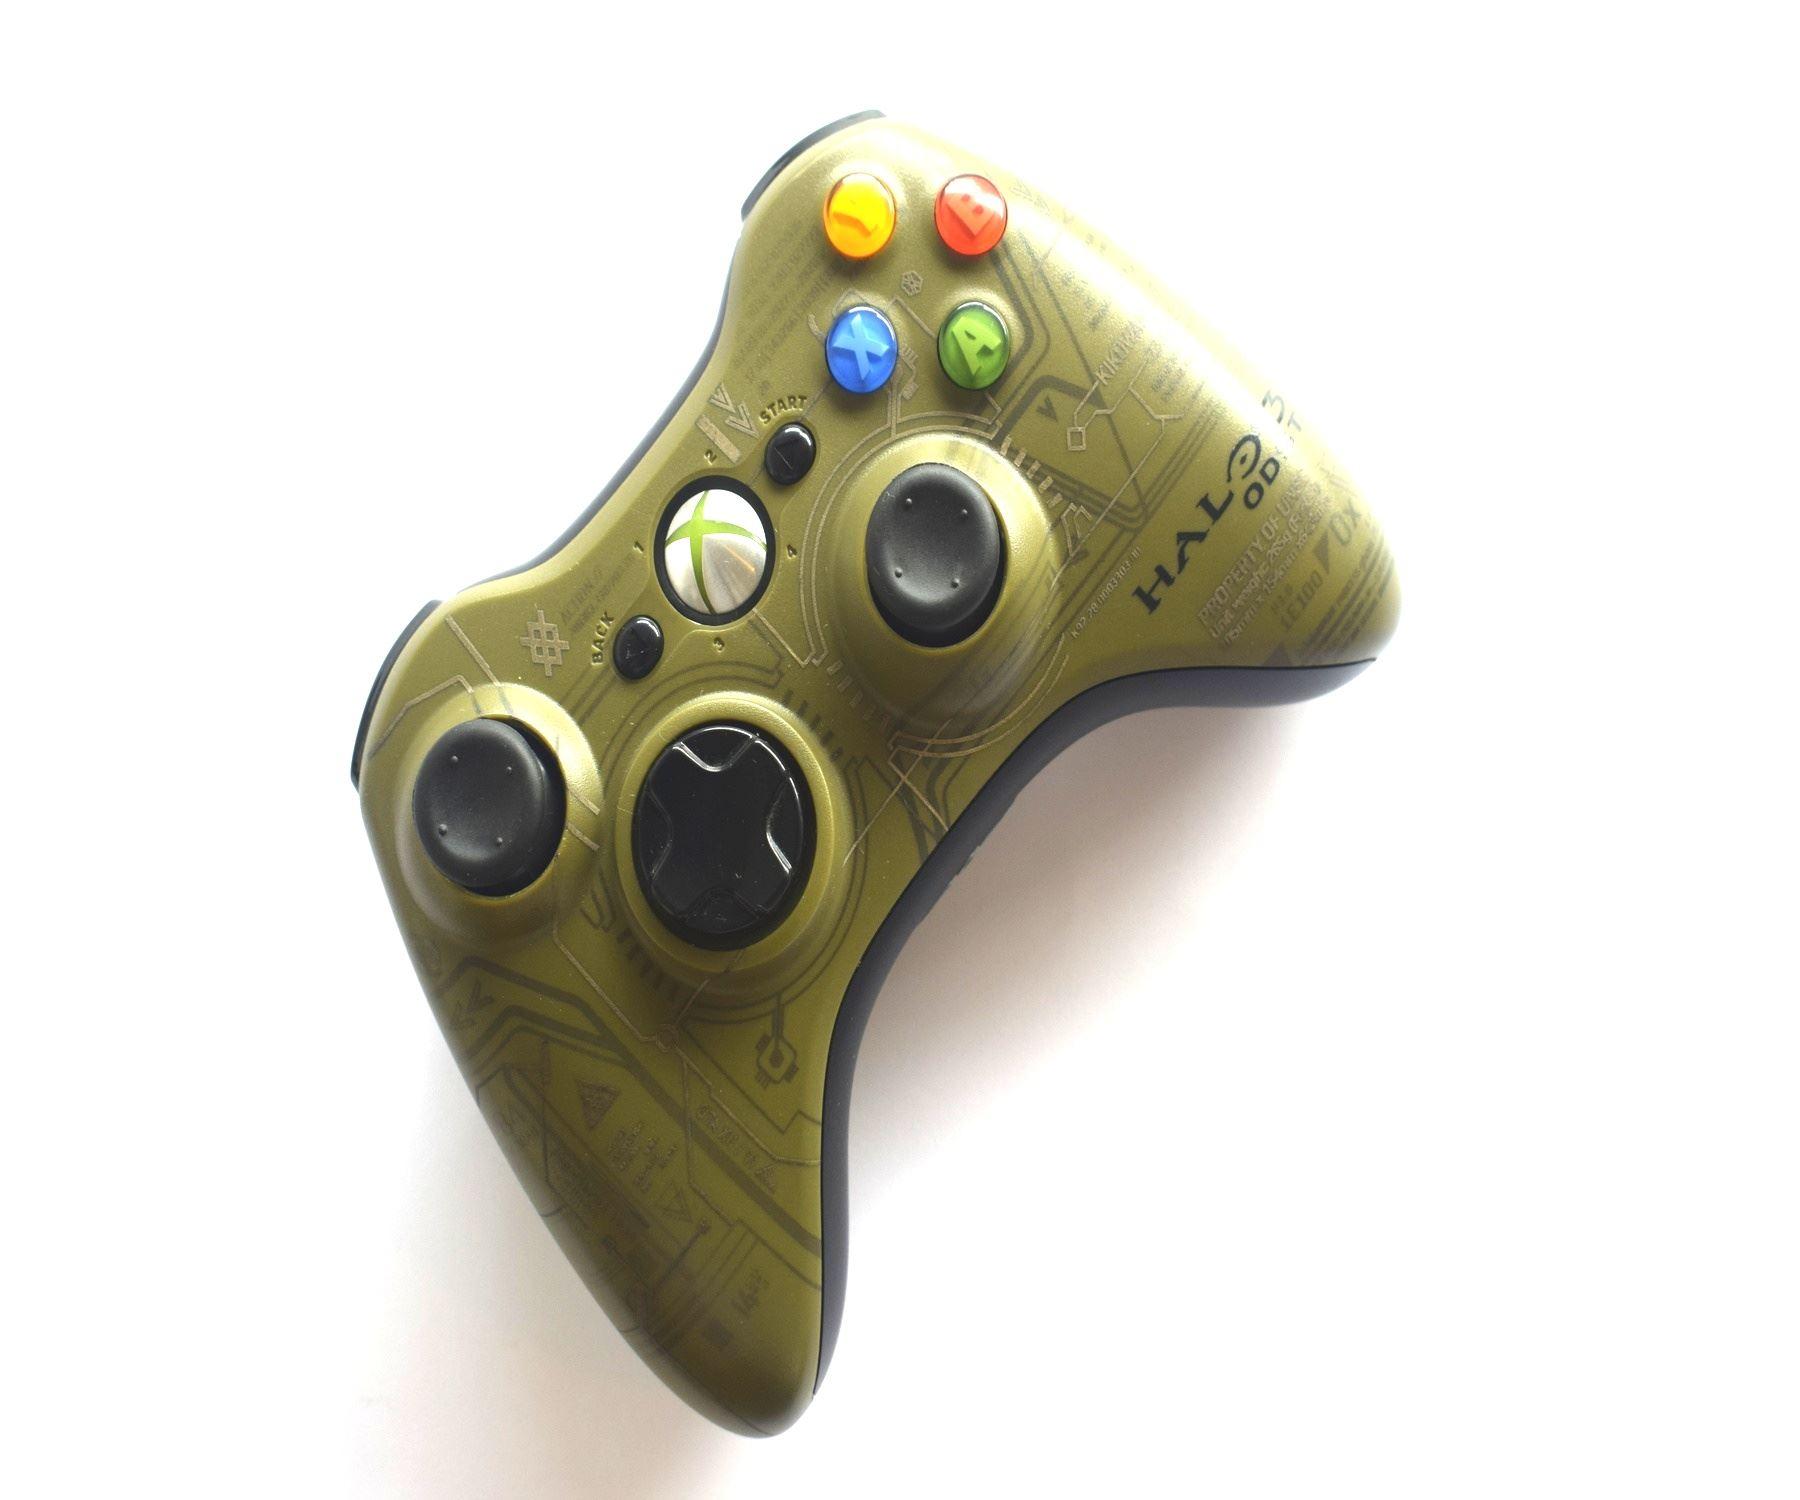 Official-Original-Genuine-Microsoft-Xbox-360-Controller-Pads-Various-Colours thumbnail 30